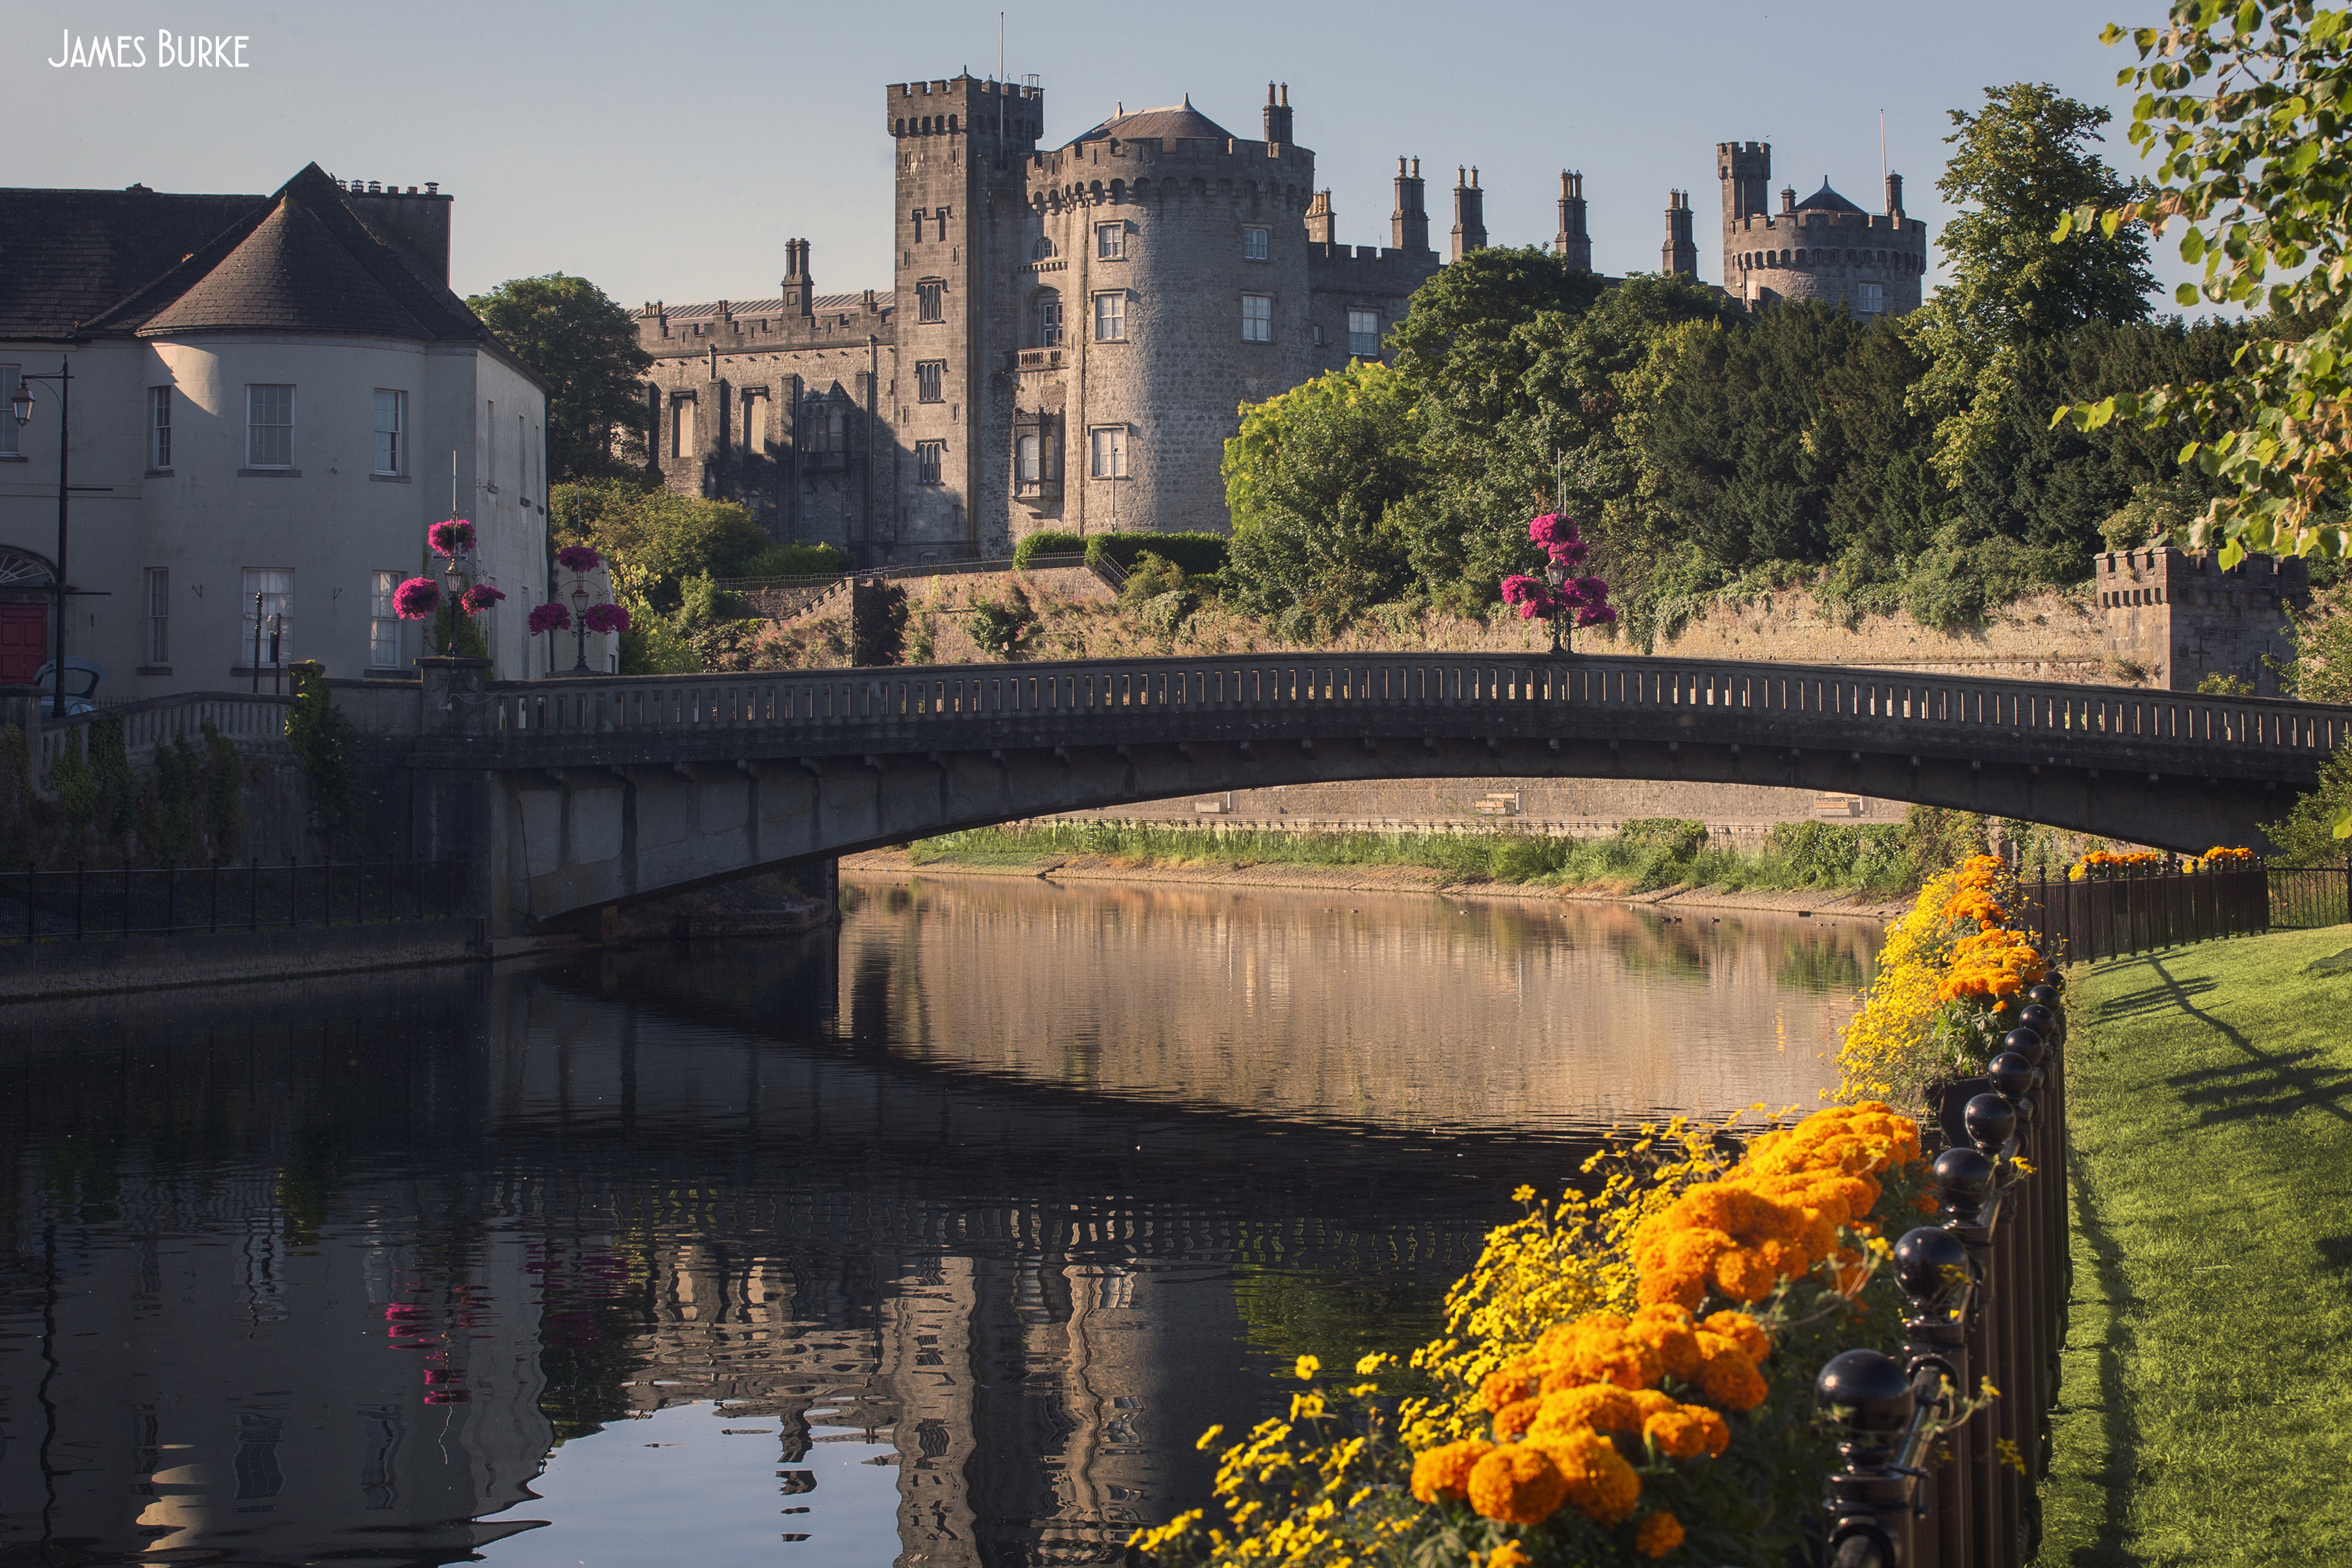 commercial photography kilkenny, product photography, kilkenny, ireland